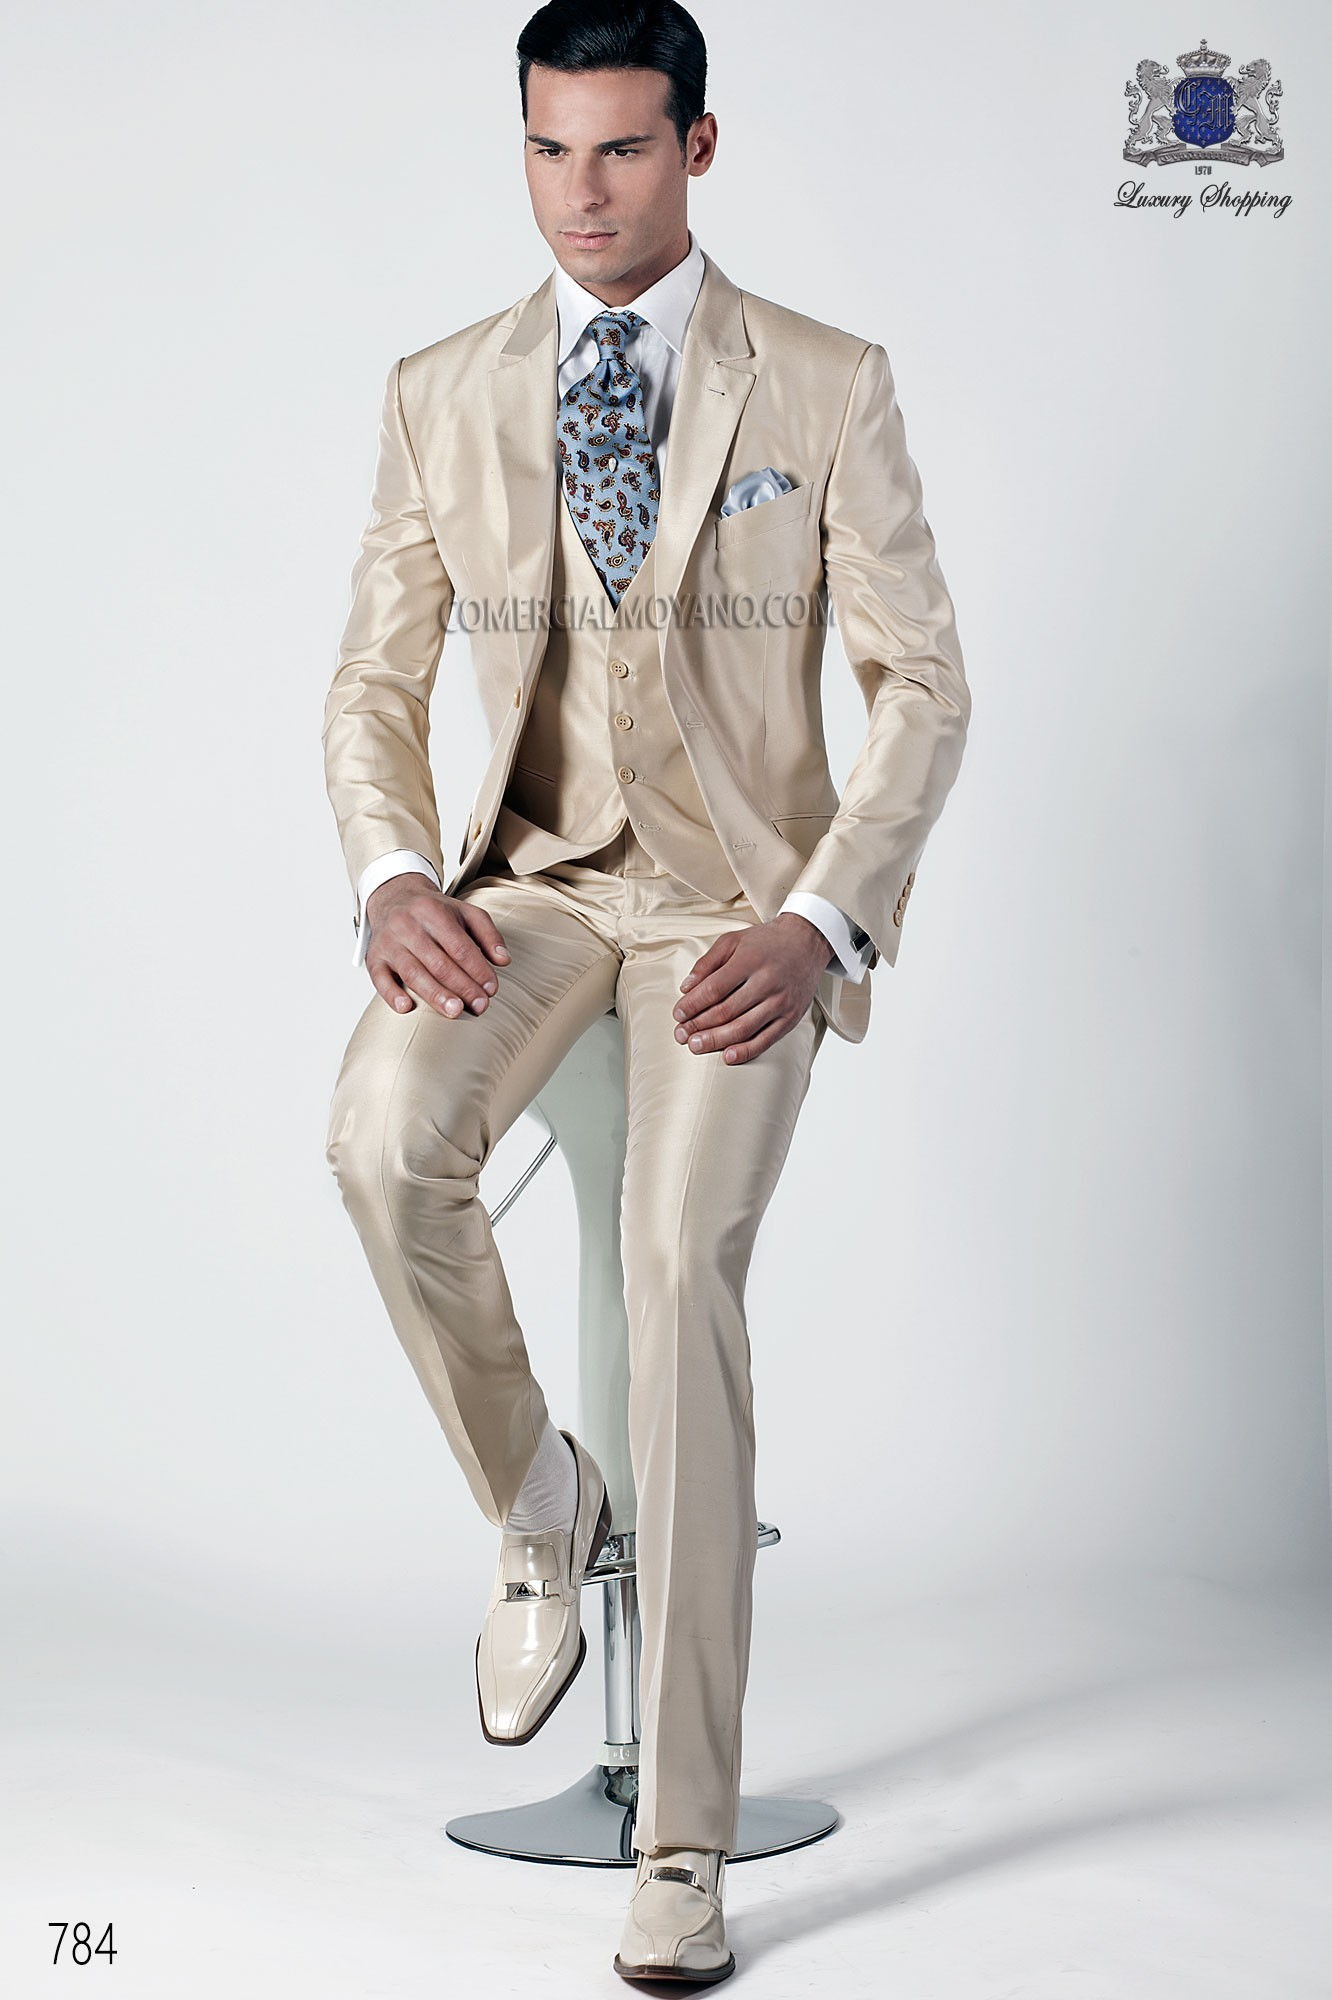 Traje de novio Hipster beige modelo: 784 Ottavio Nuccio Gala colección Hipster 2017